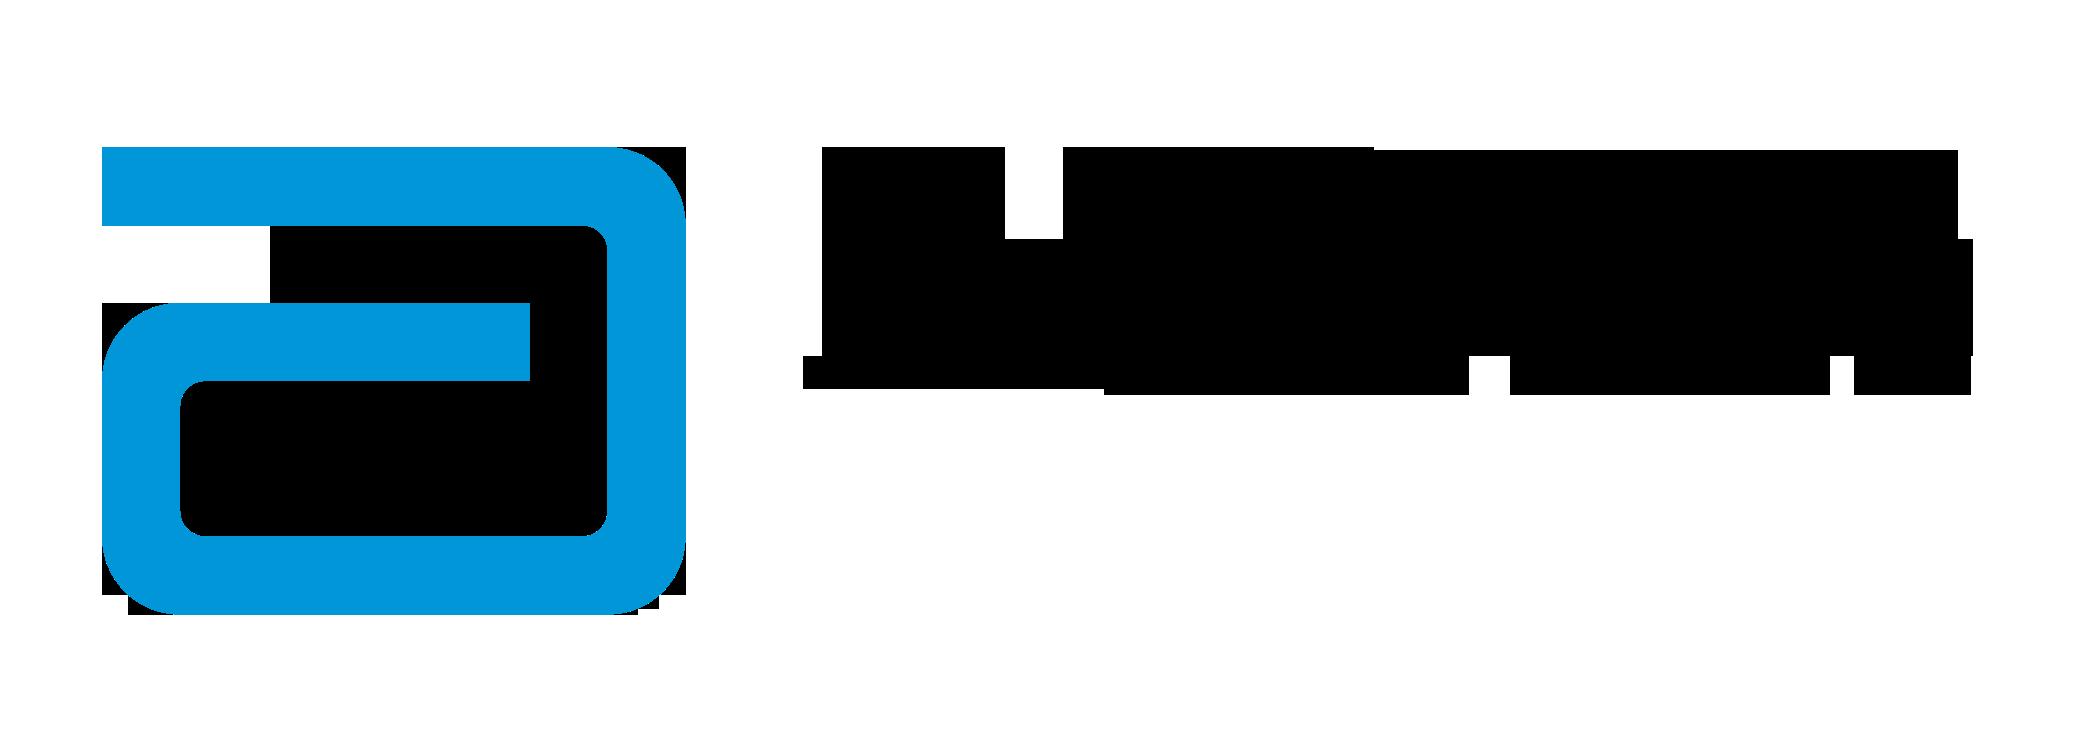 Abbott Logo PNG Image.